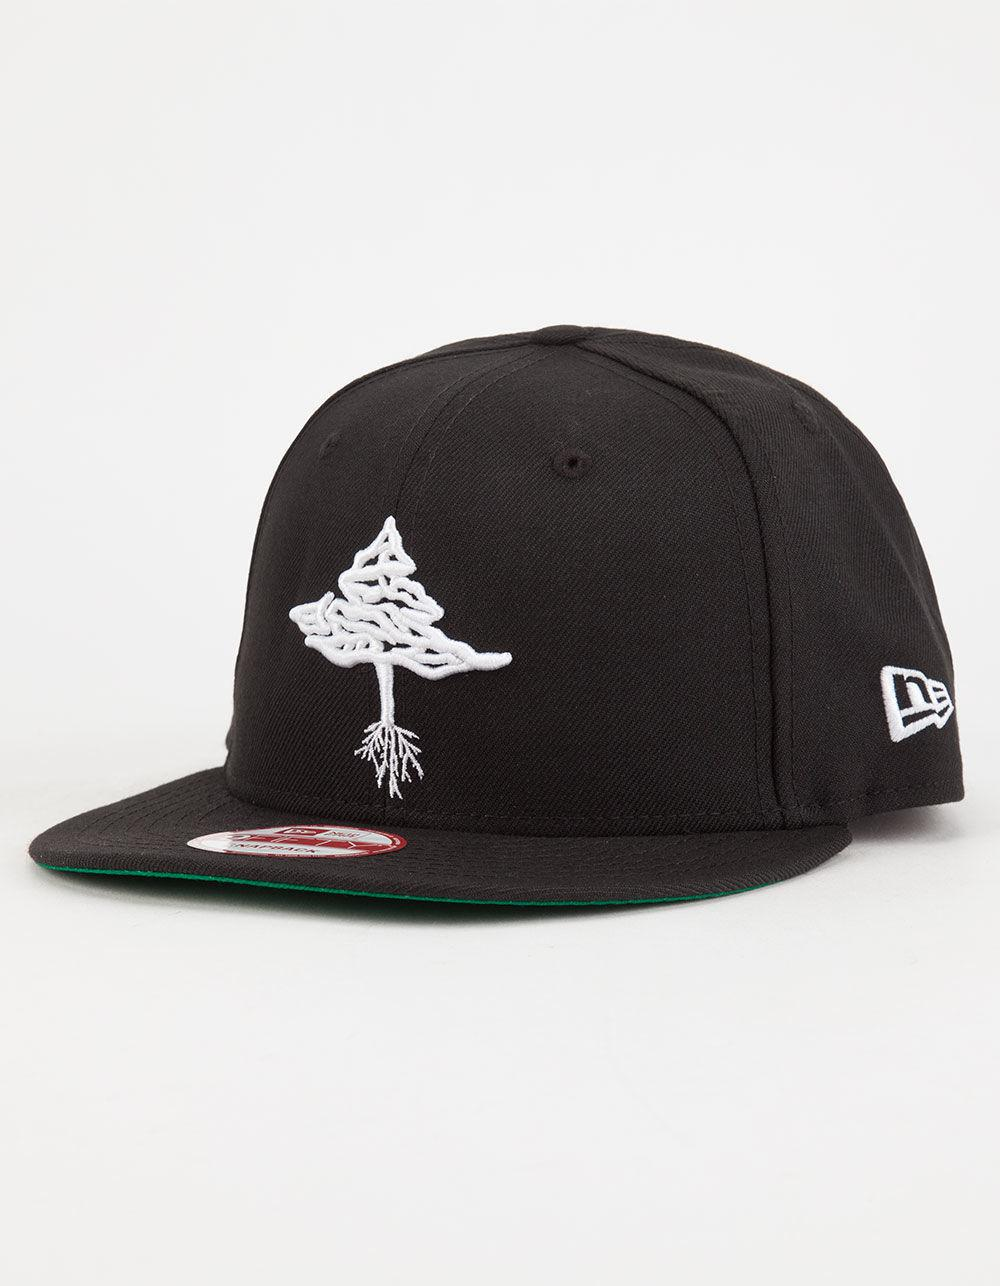 2cc5c954d81 Lyst - LRG Retro Eternity Mens Snapback Hat in Black for Men